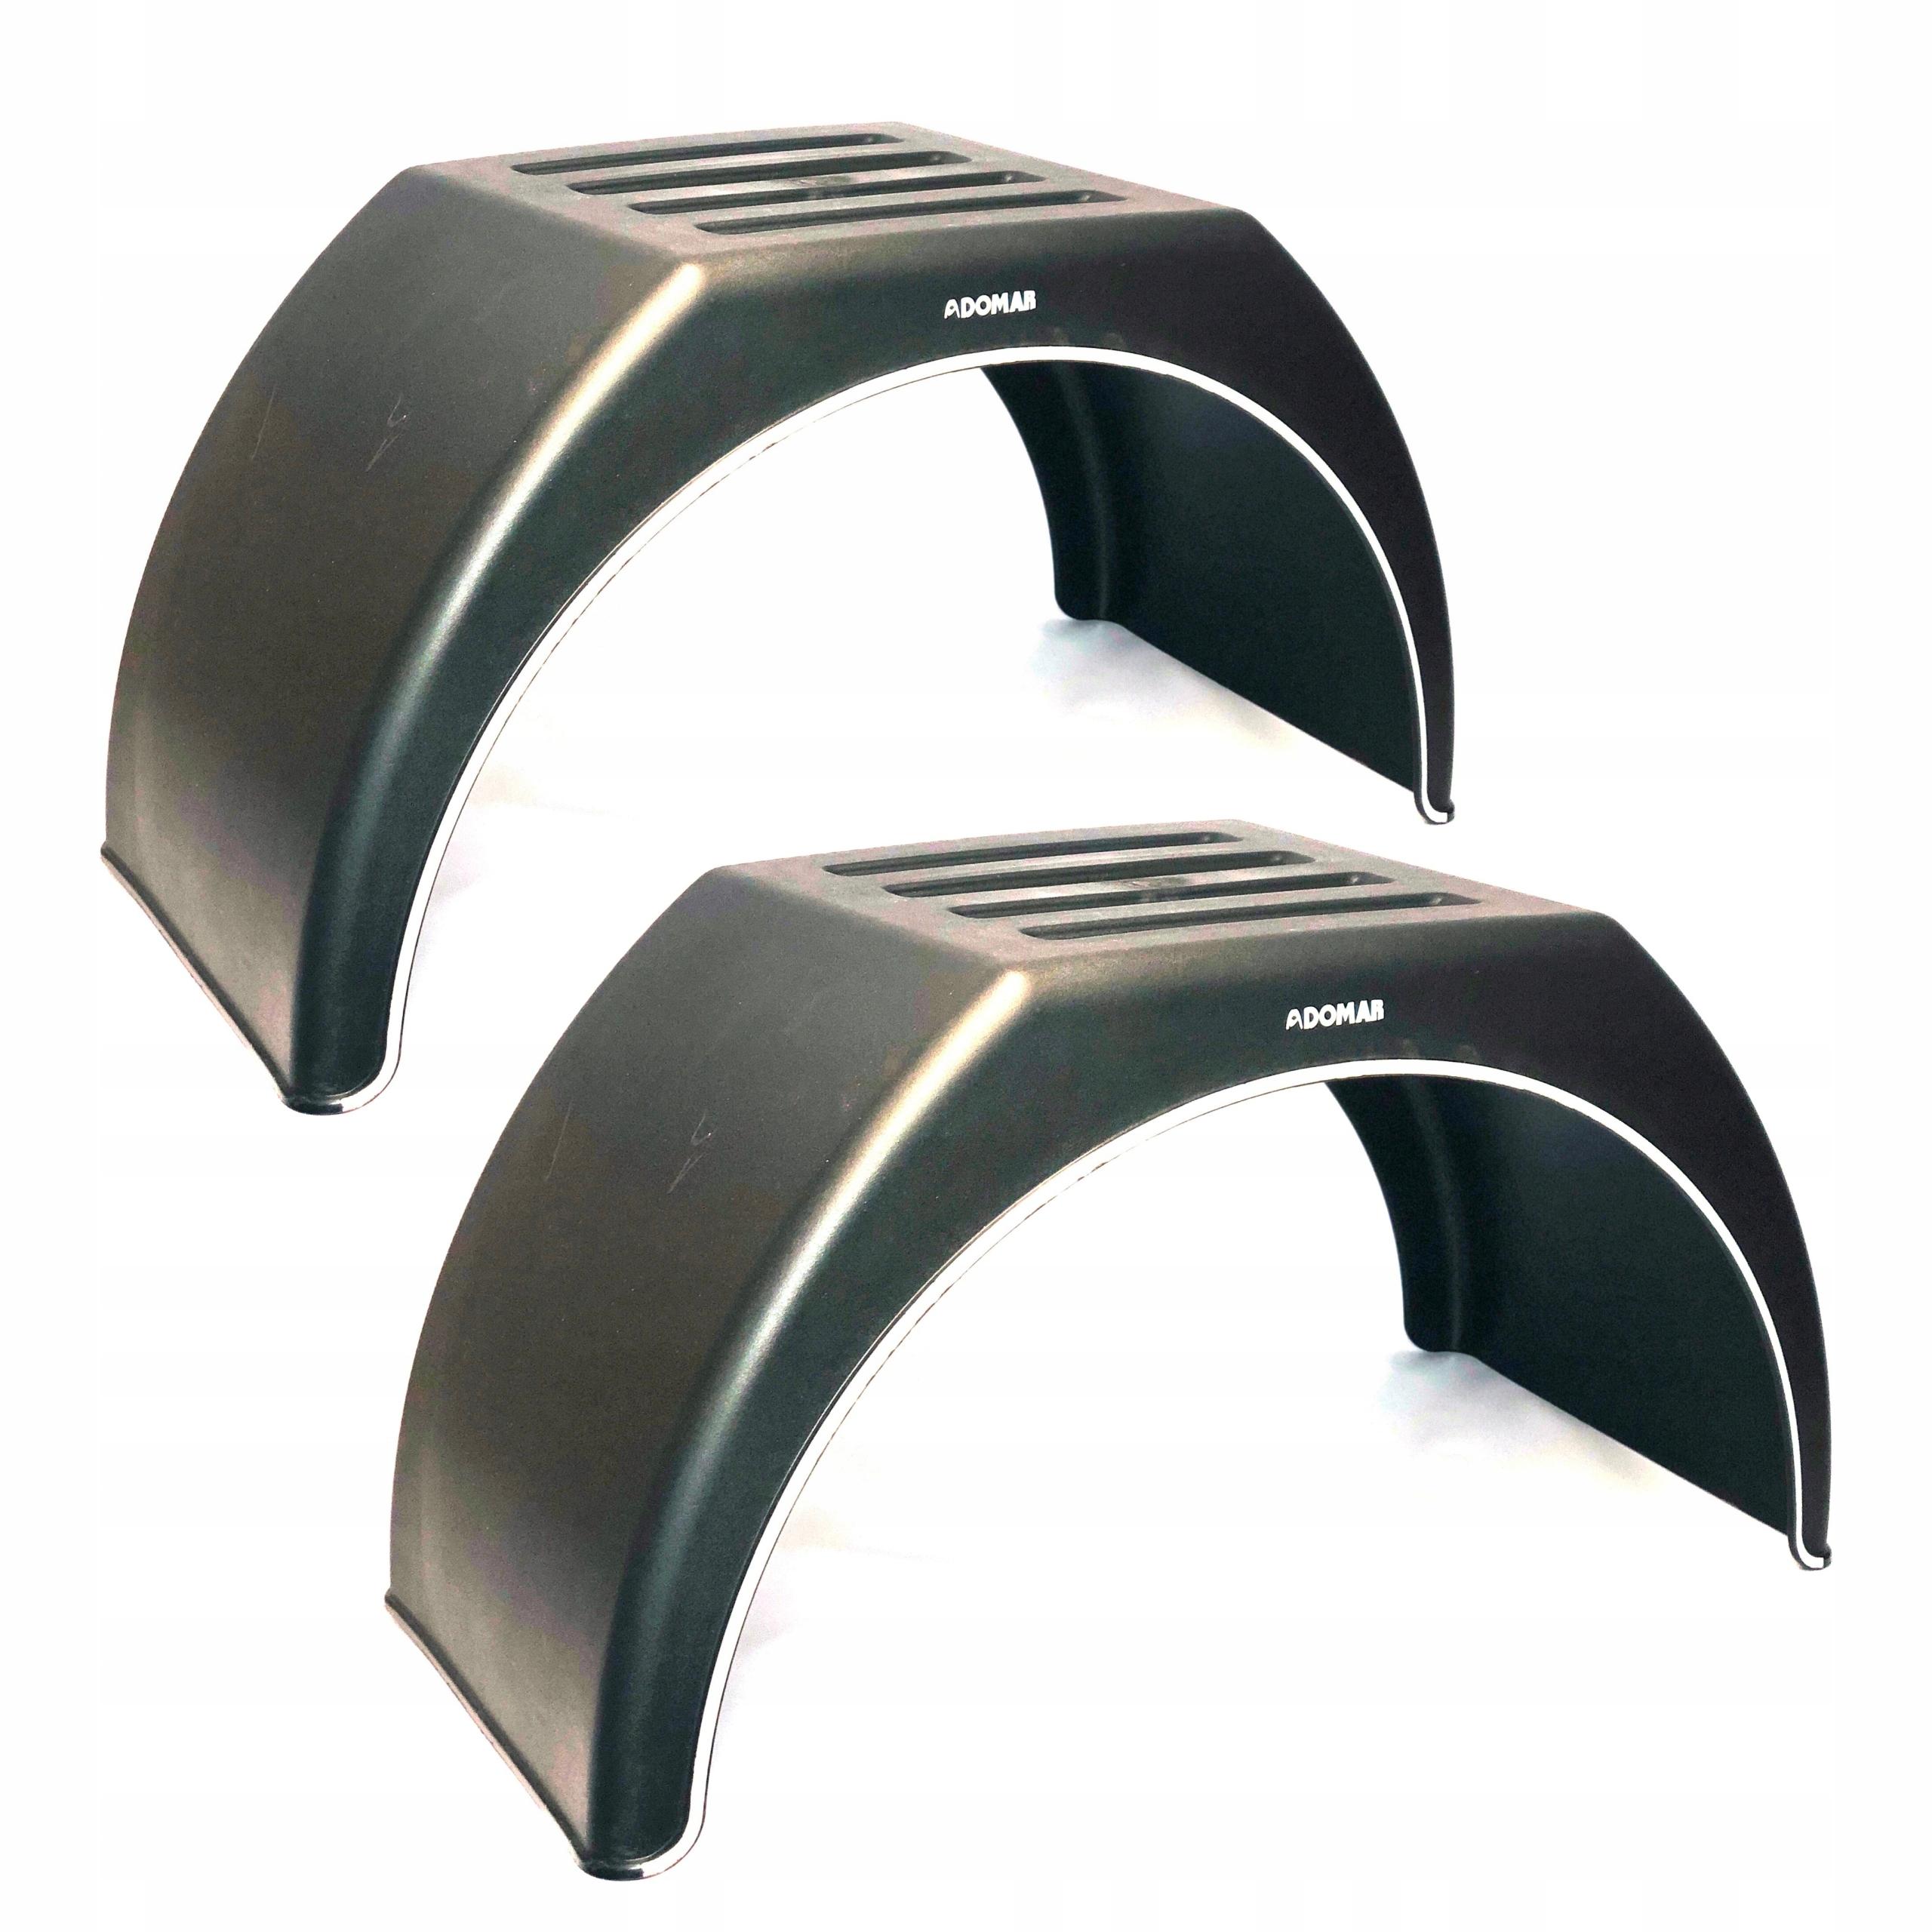 2 x крыло близнец локер колесной арки domar 15 16